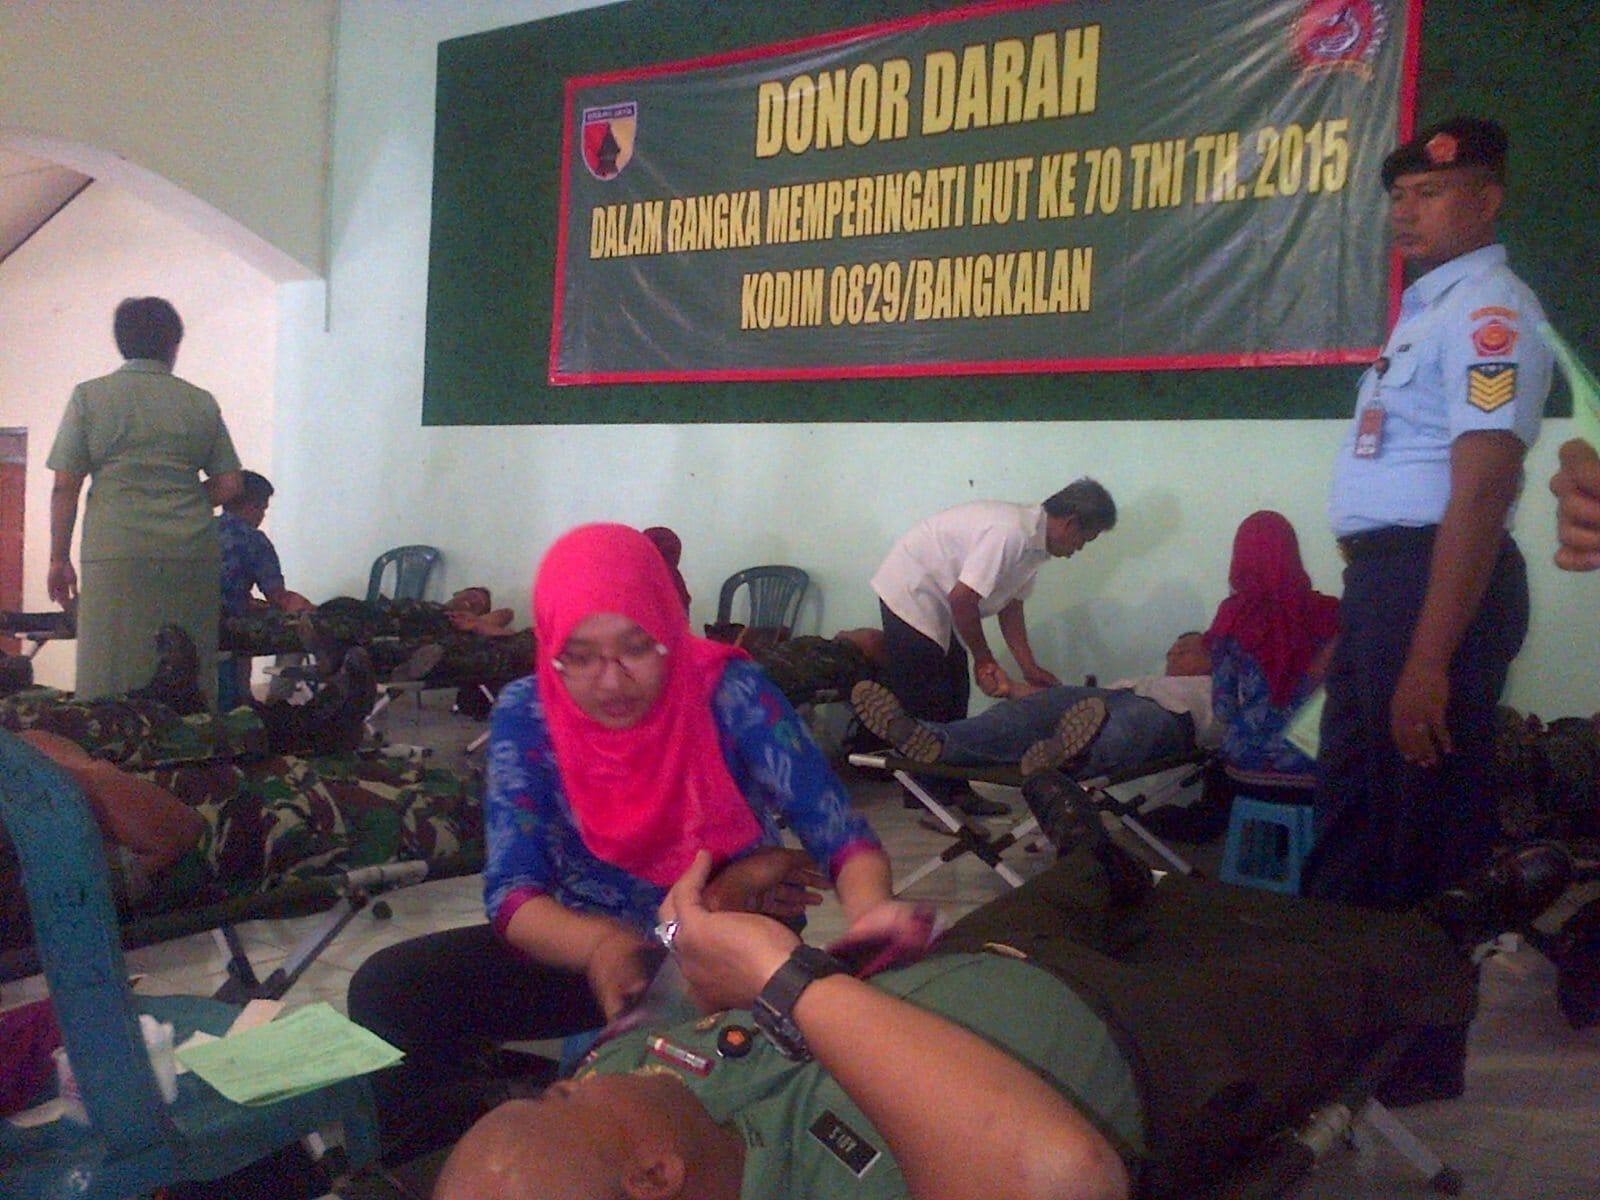 Kodim Bersama PMI Bangkalan Gelar Donor Darah